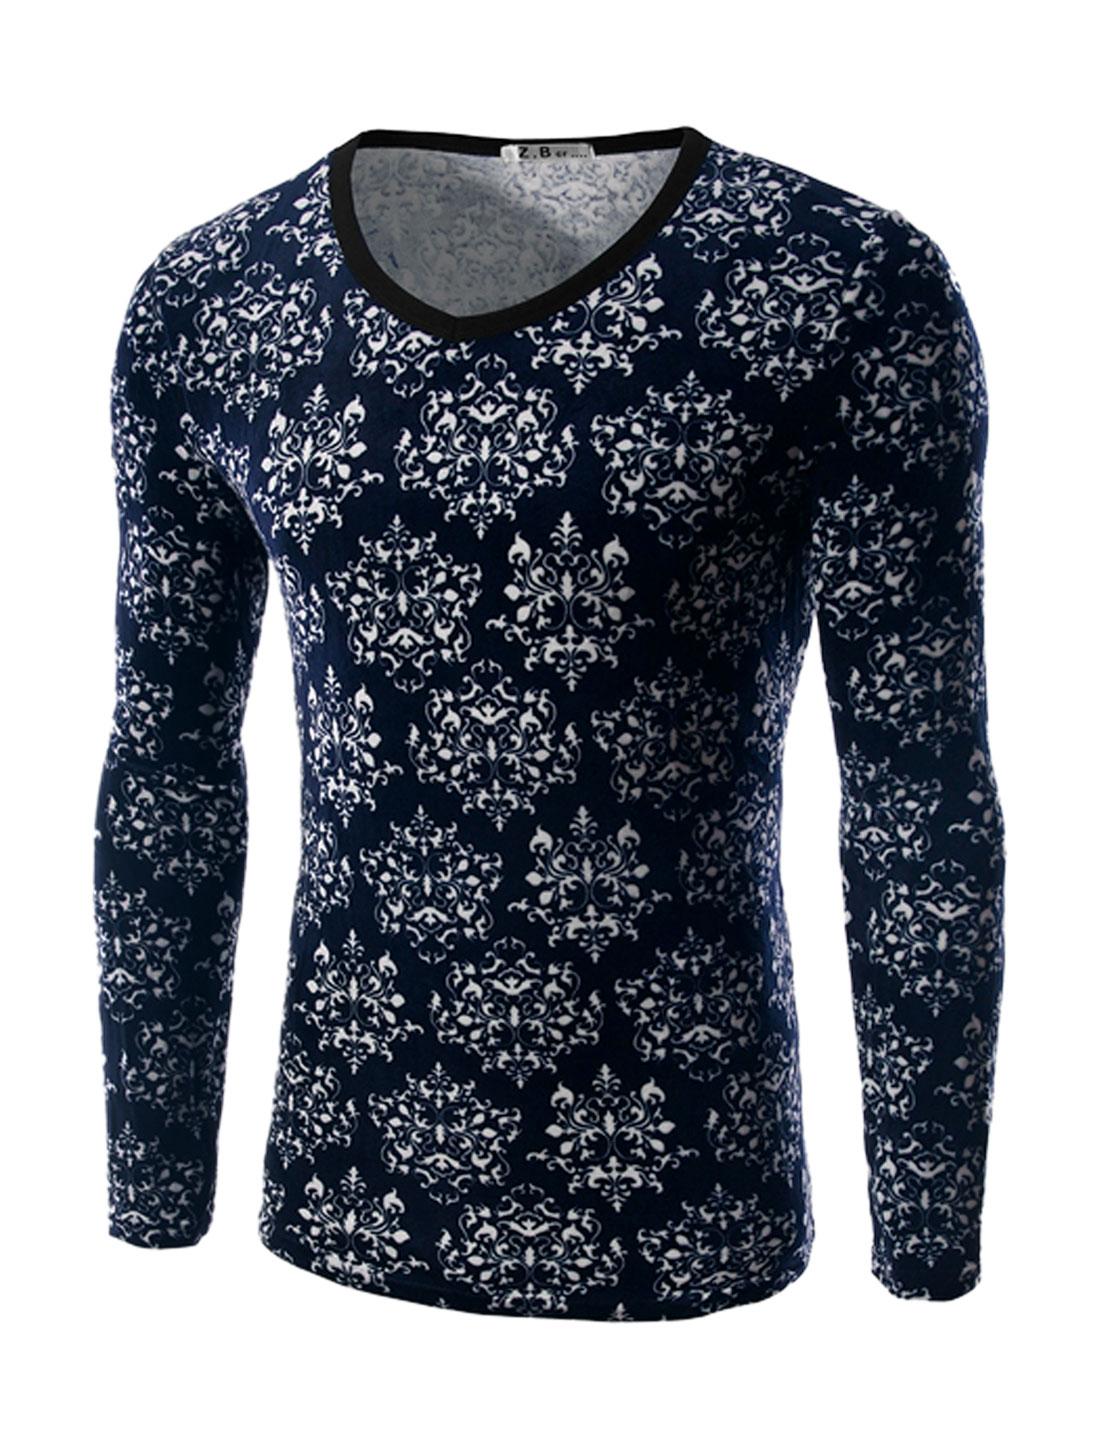 Man V Neck Long Sleeves Jacquard Plush Slim Fit T-Shirt Blue M